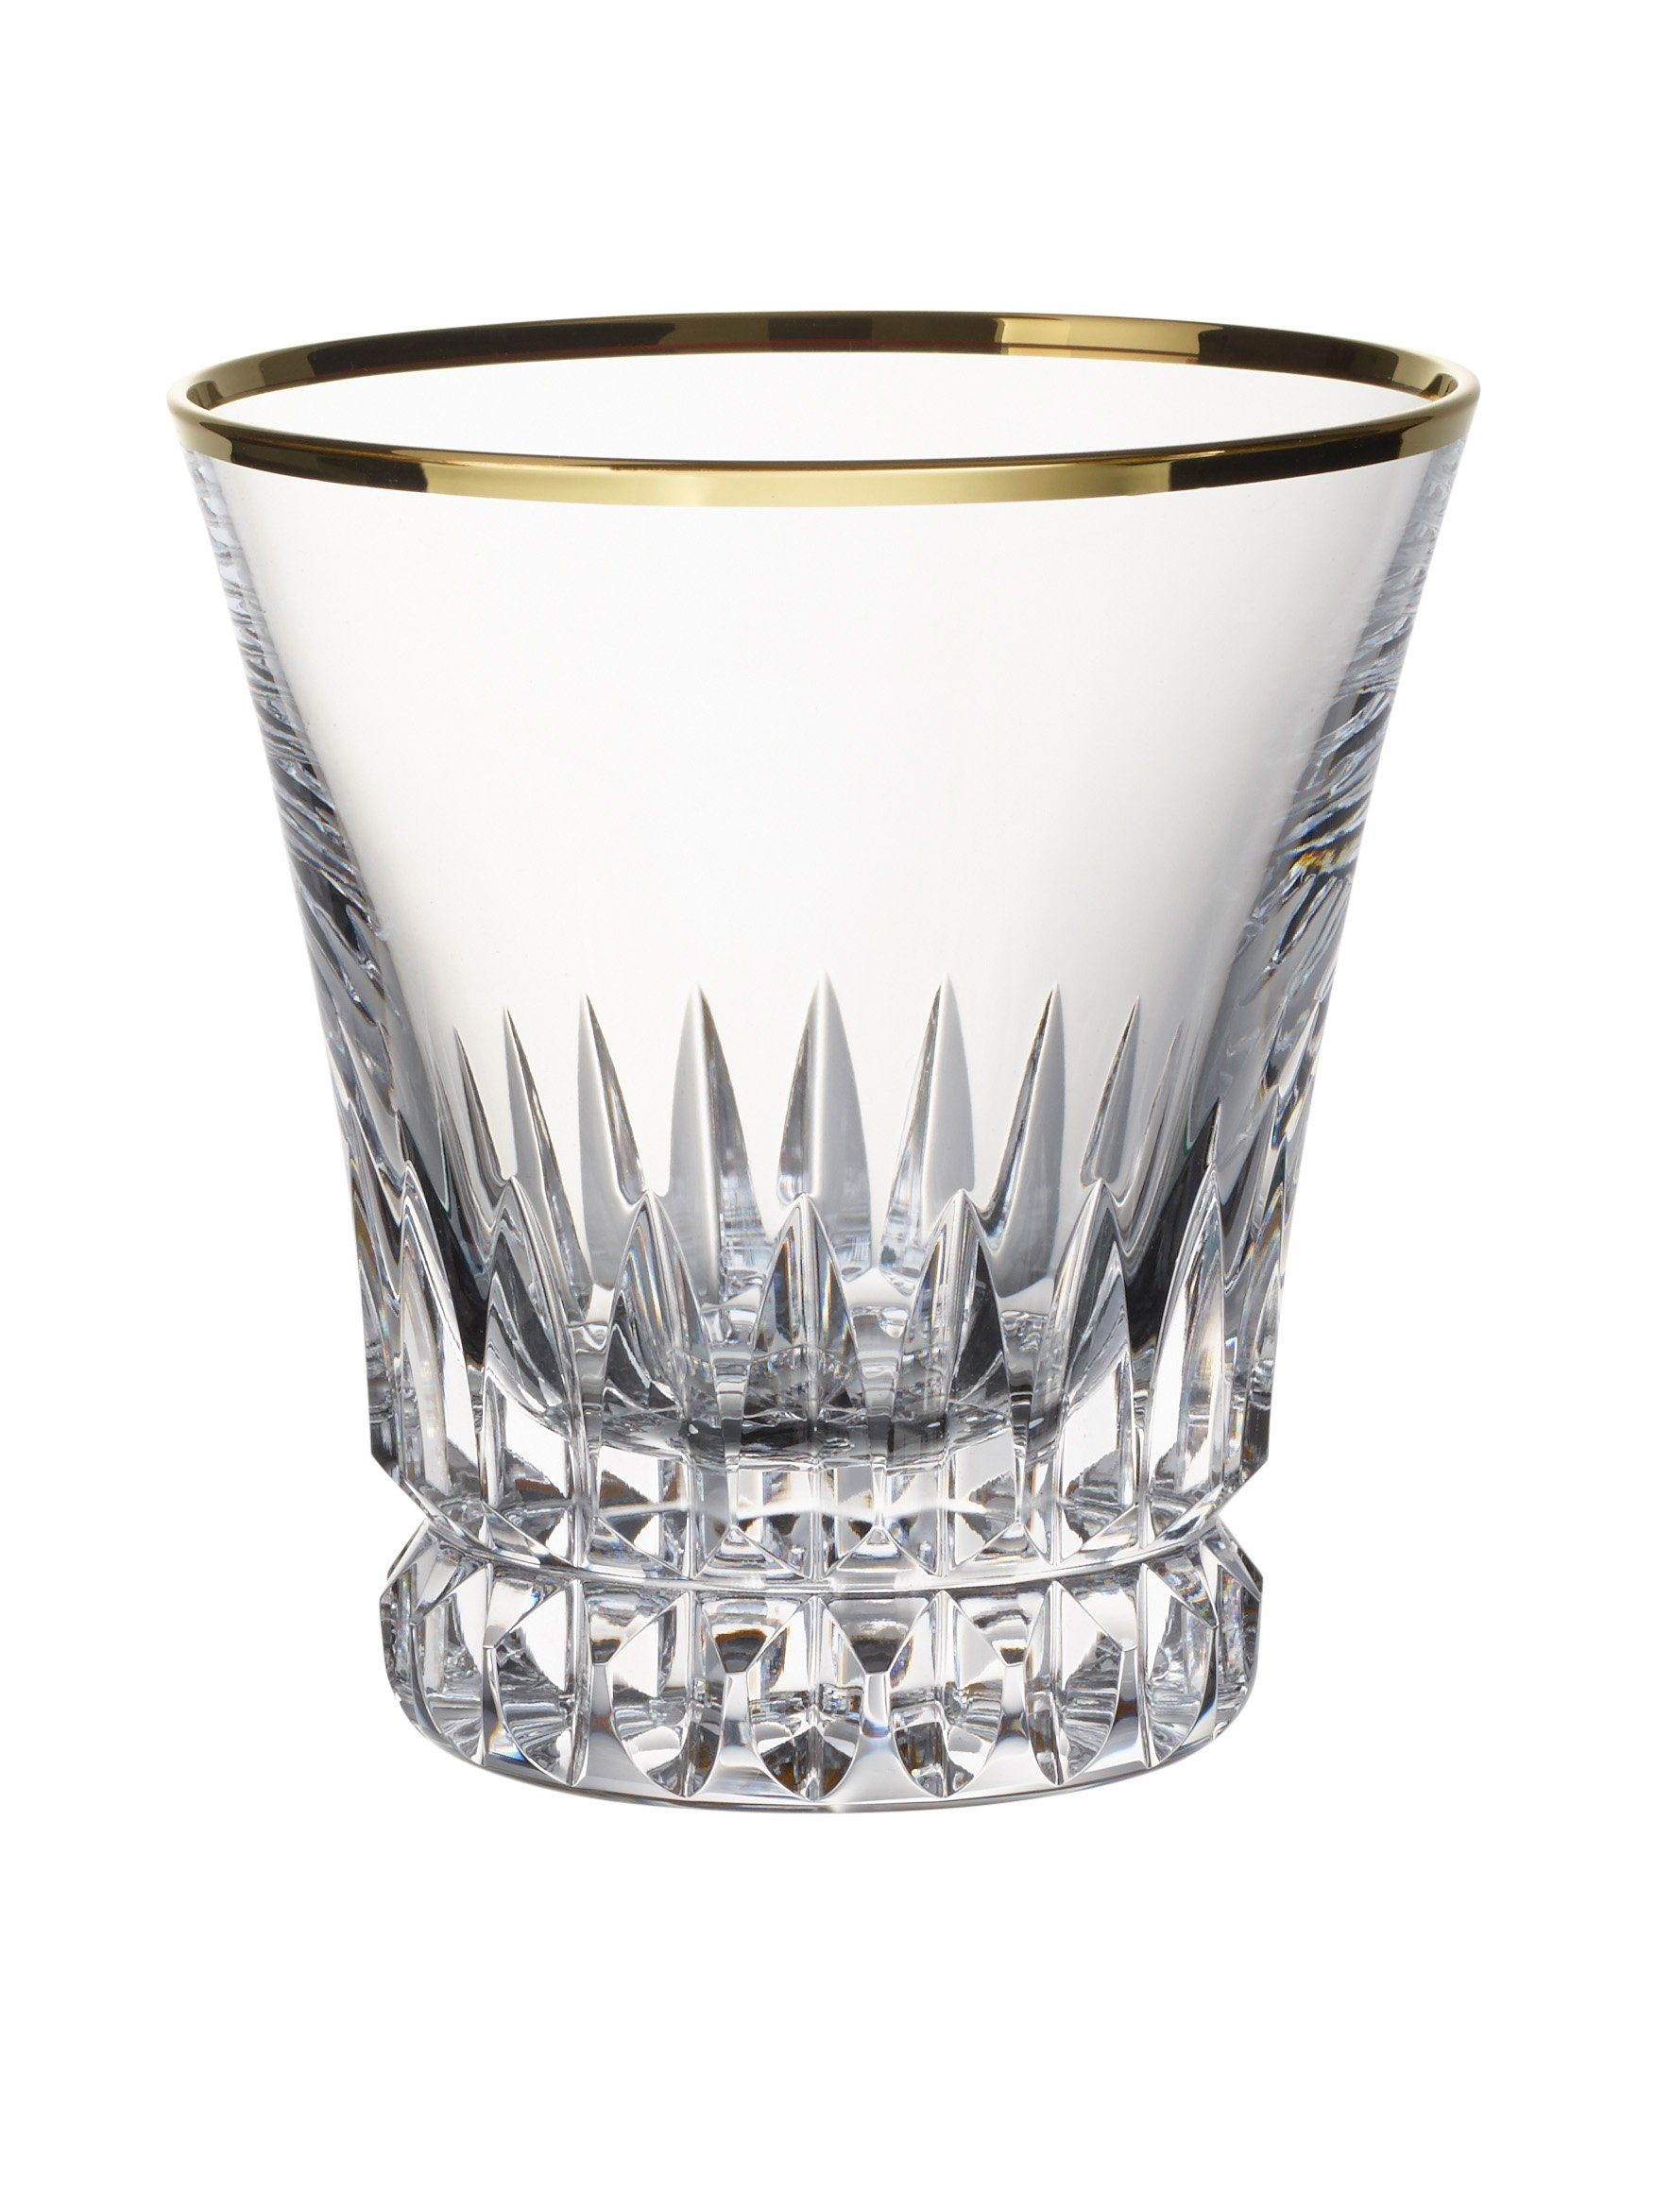 Villeroy & Boch Wasserglas Grand Royal Gold Villeroy & Boch »Grand Royal Gold«